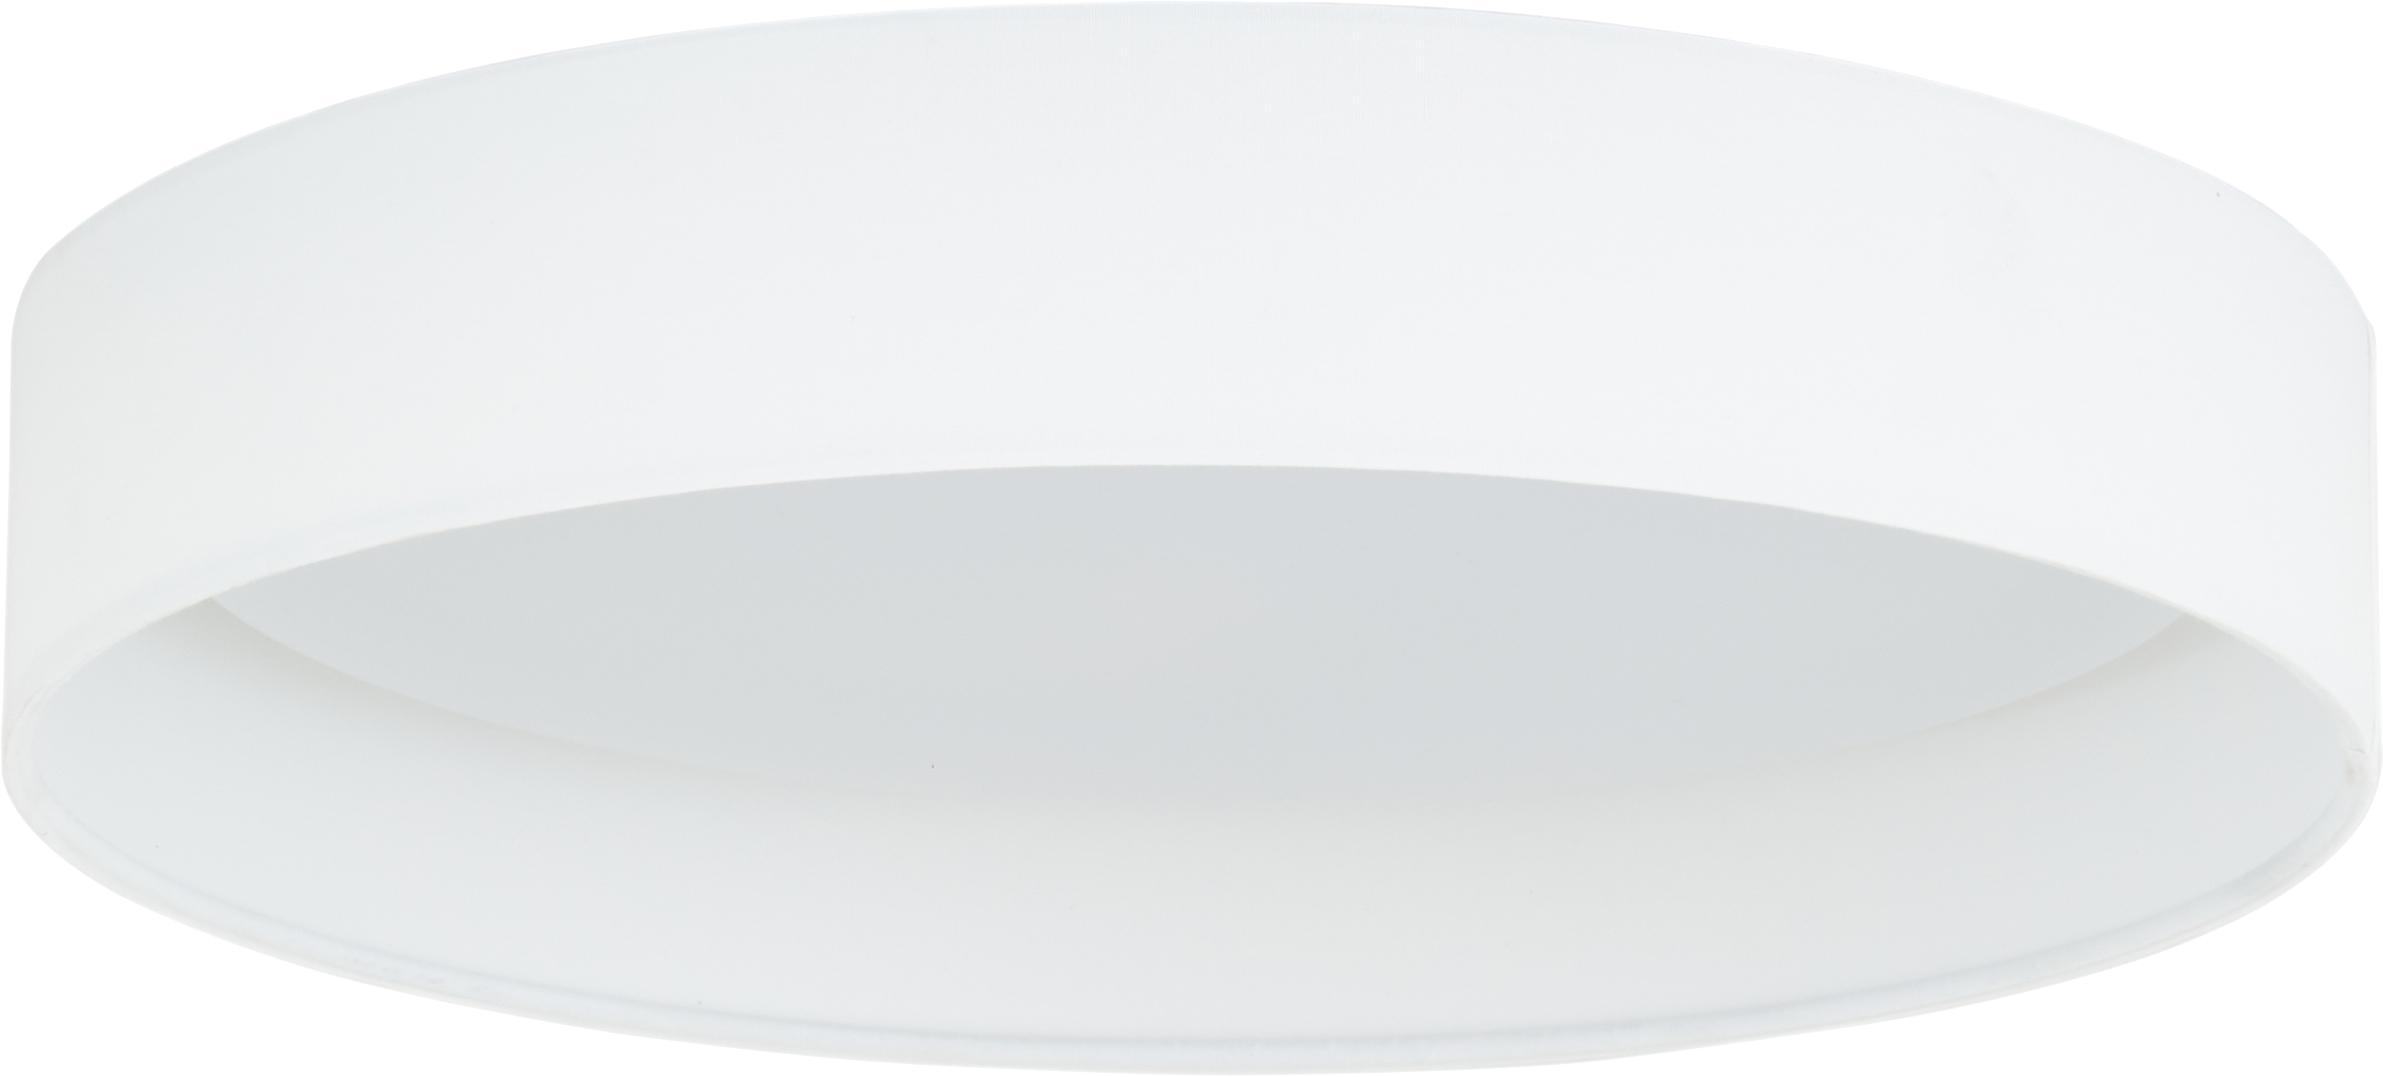 Plafonnier LED rond blanc  Helen, Blanc